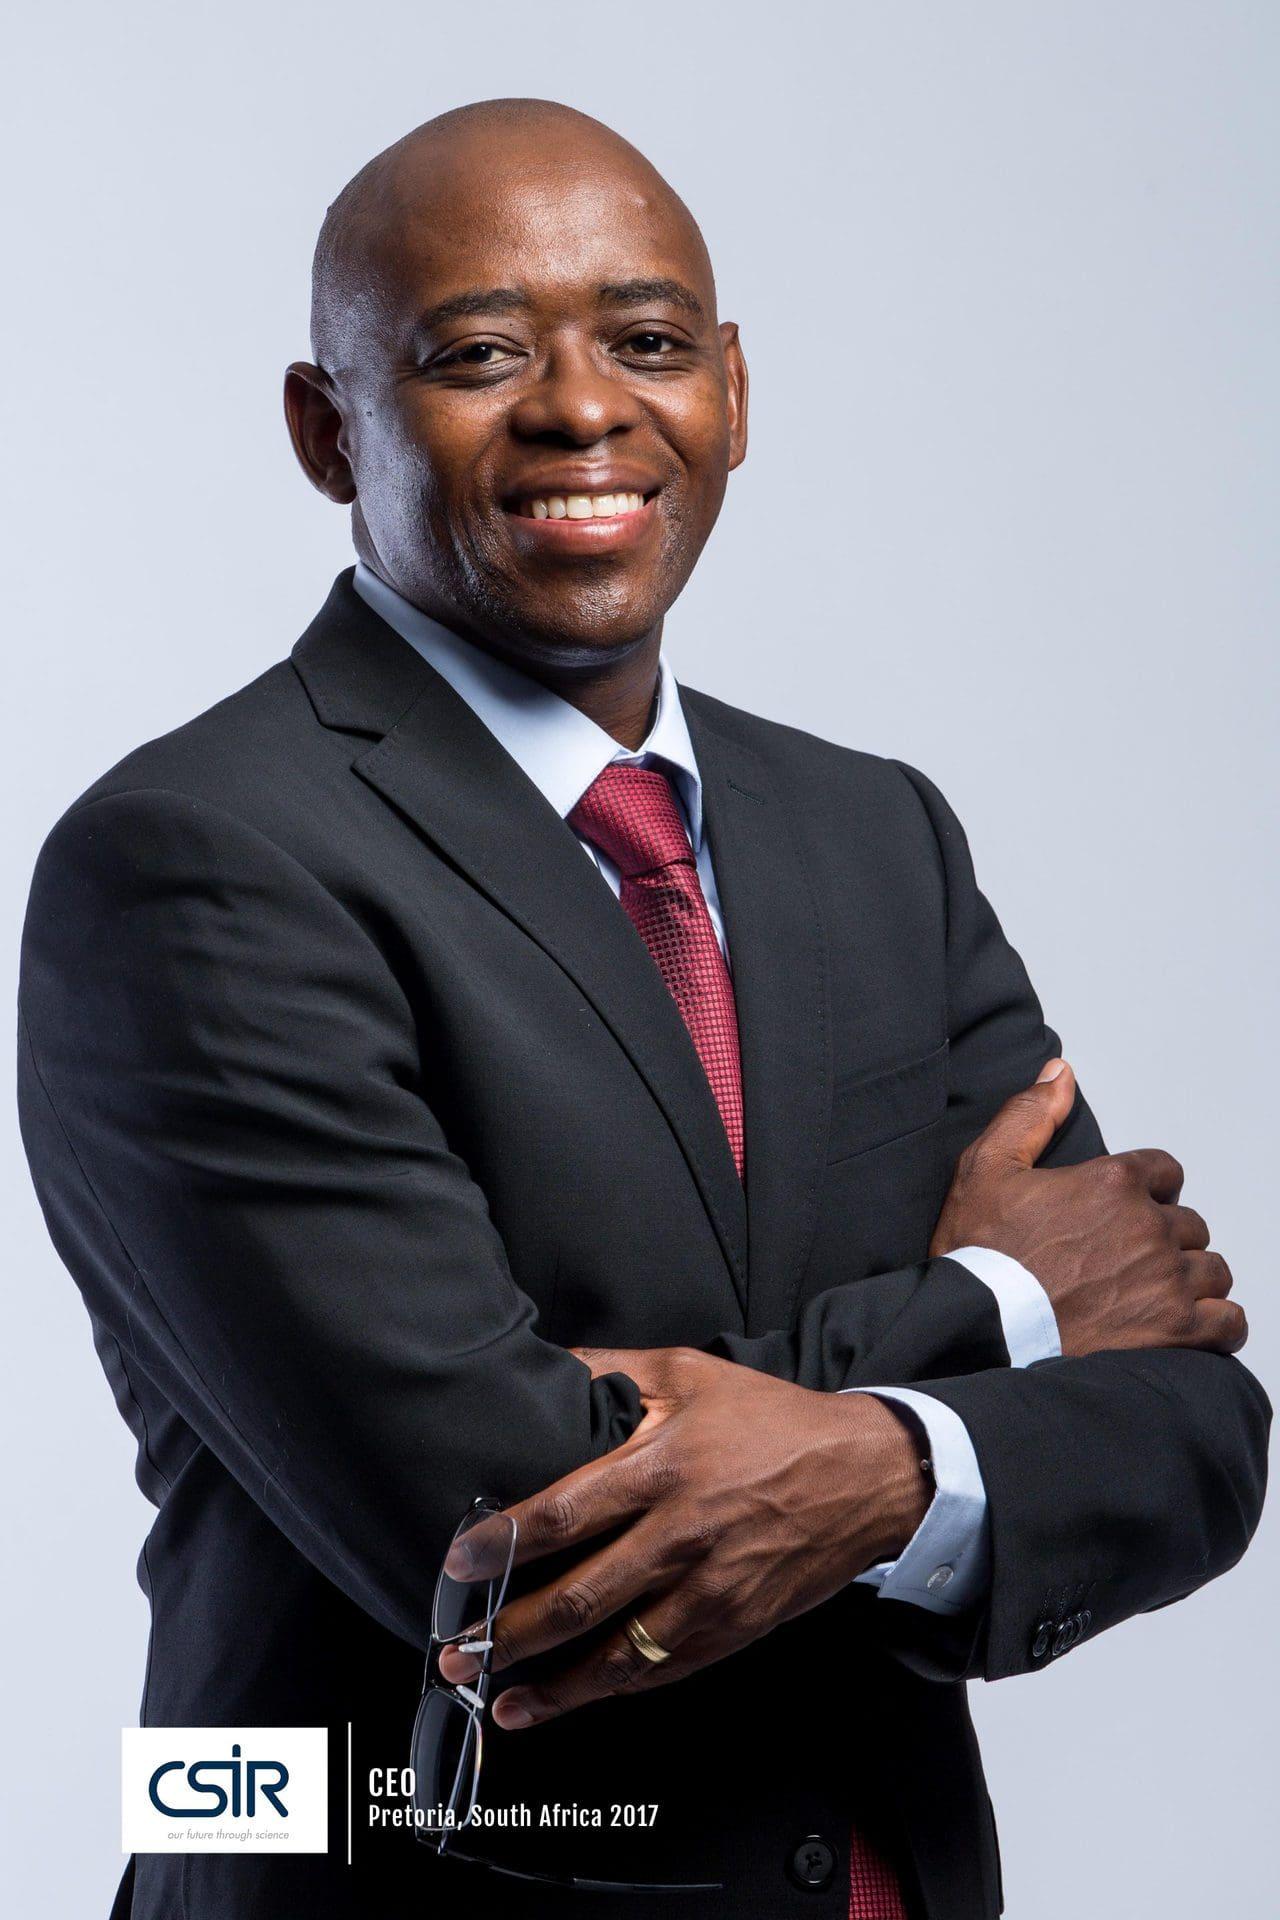 CEO of CSIR